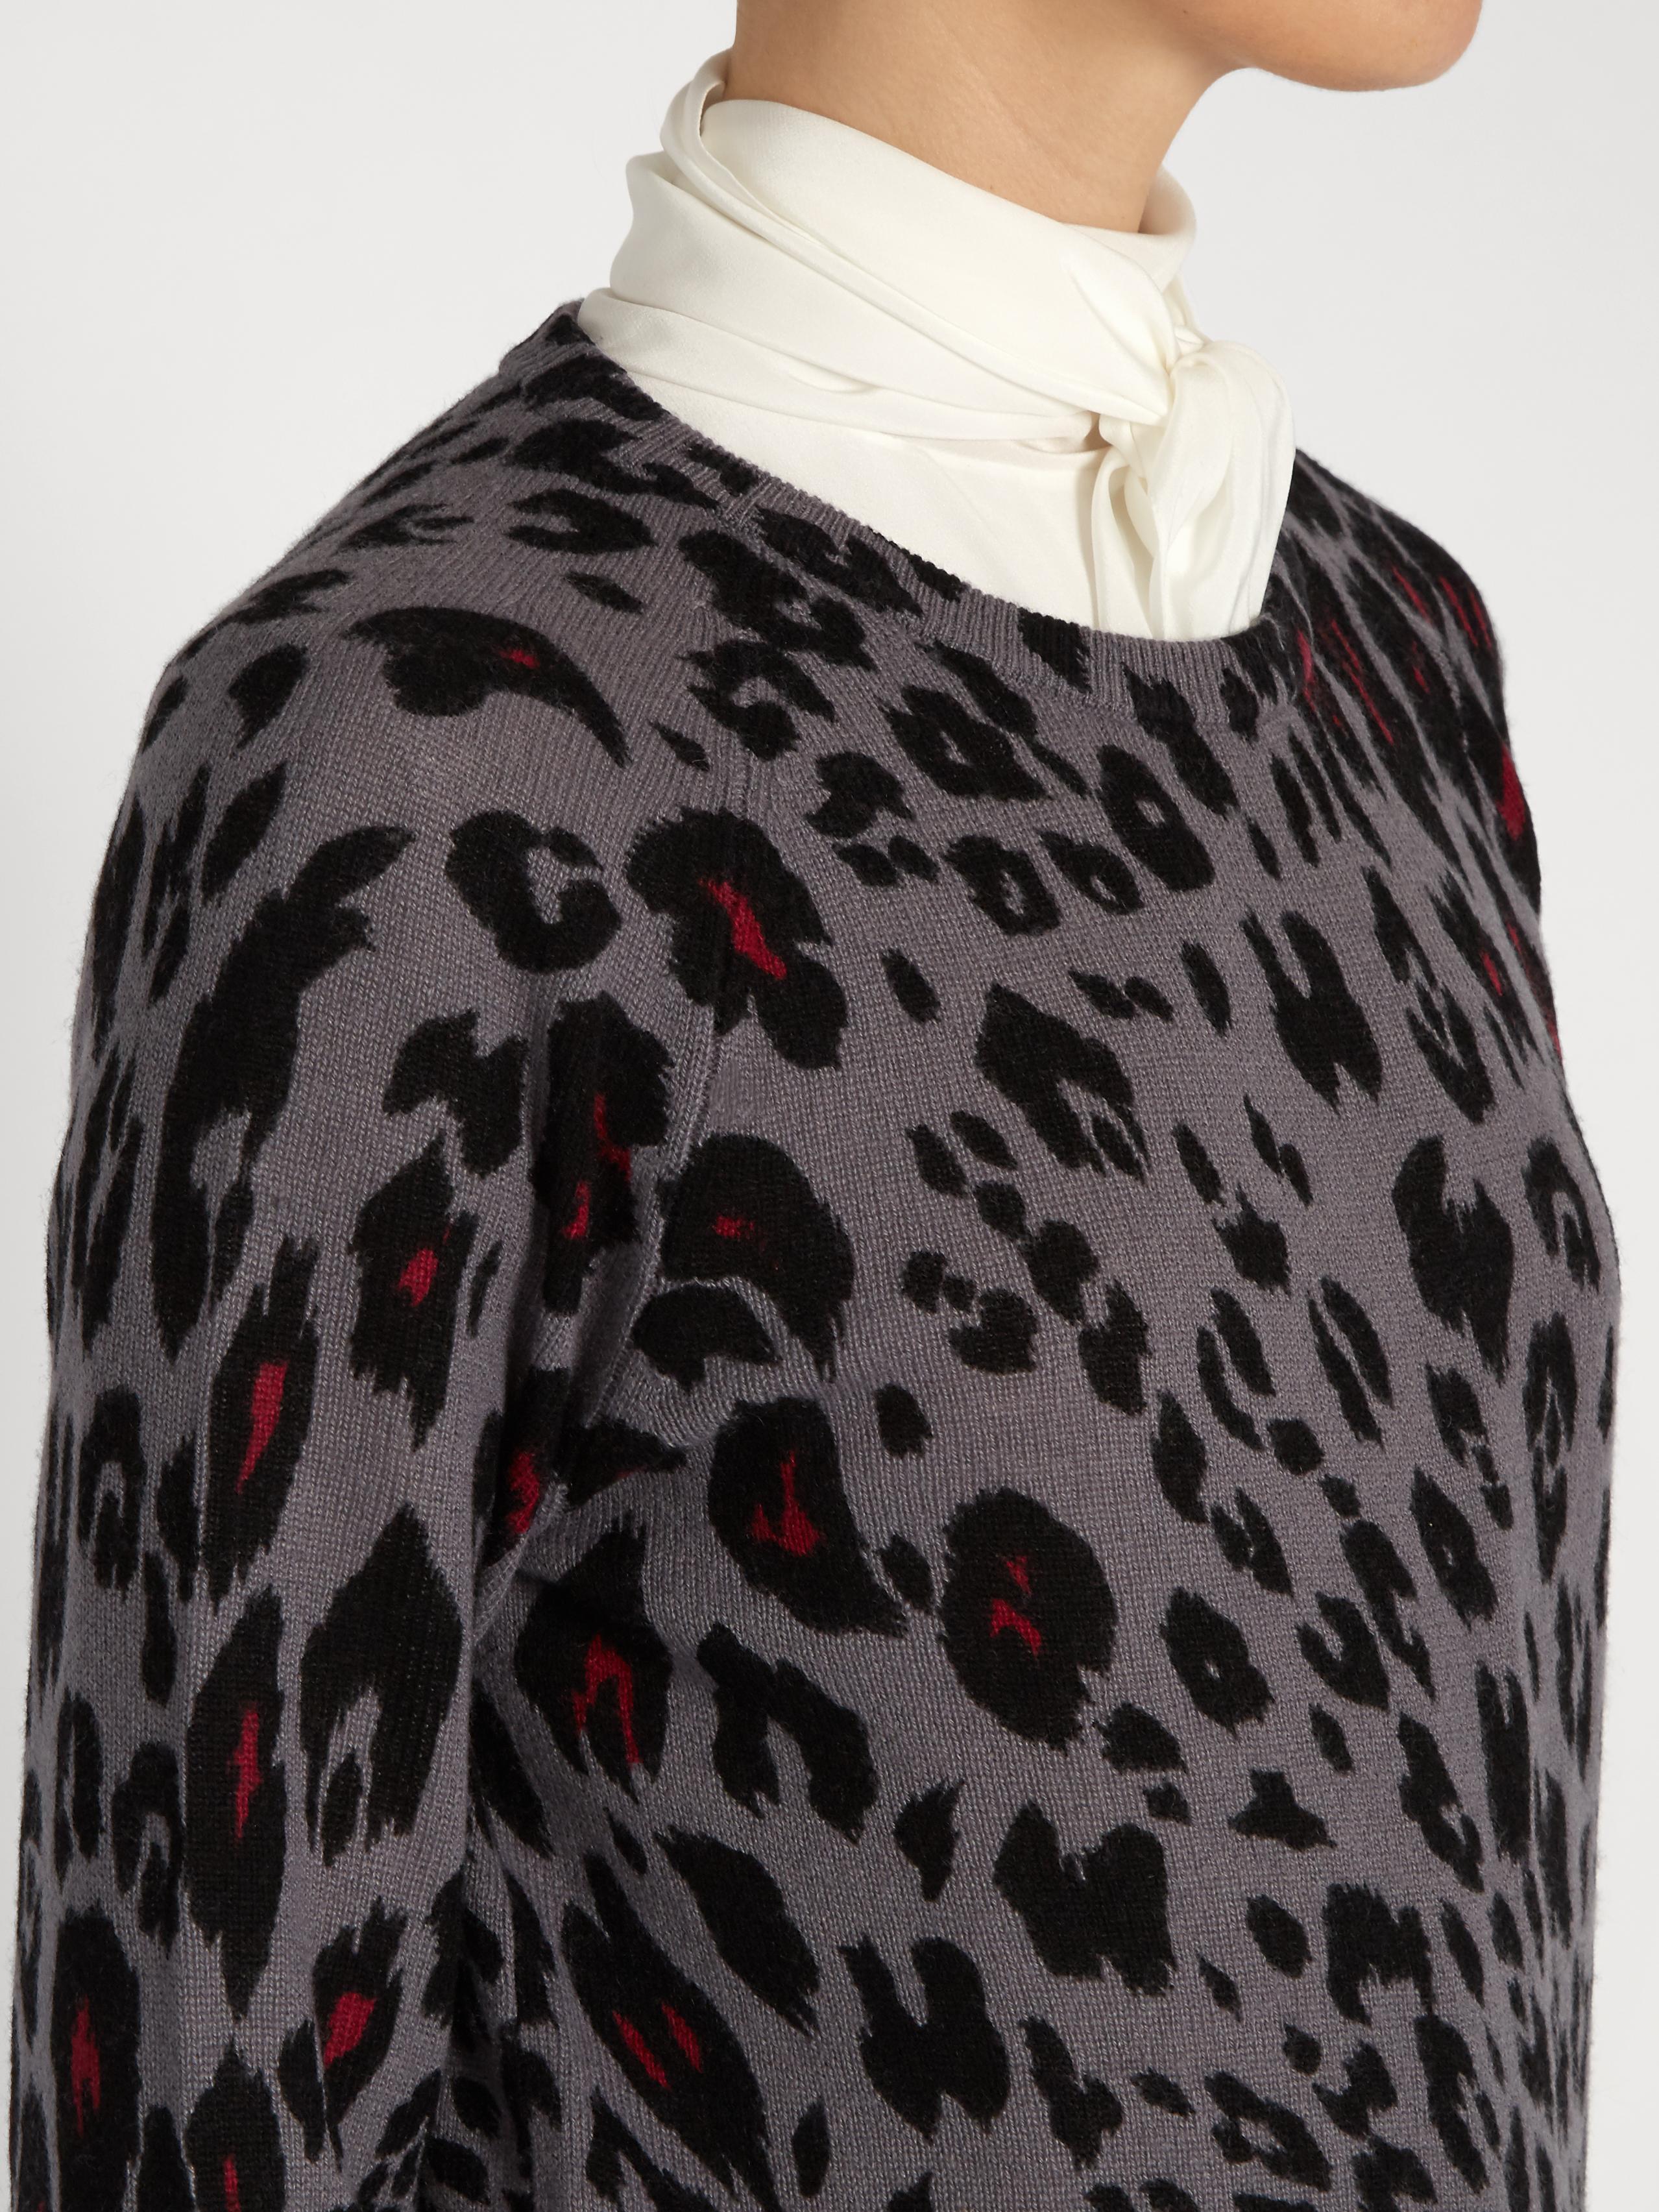 6879953e0414 Equipment Sloane Cheetah-print Cashmere Sweater in Gray - Lyst